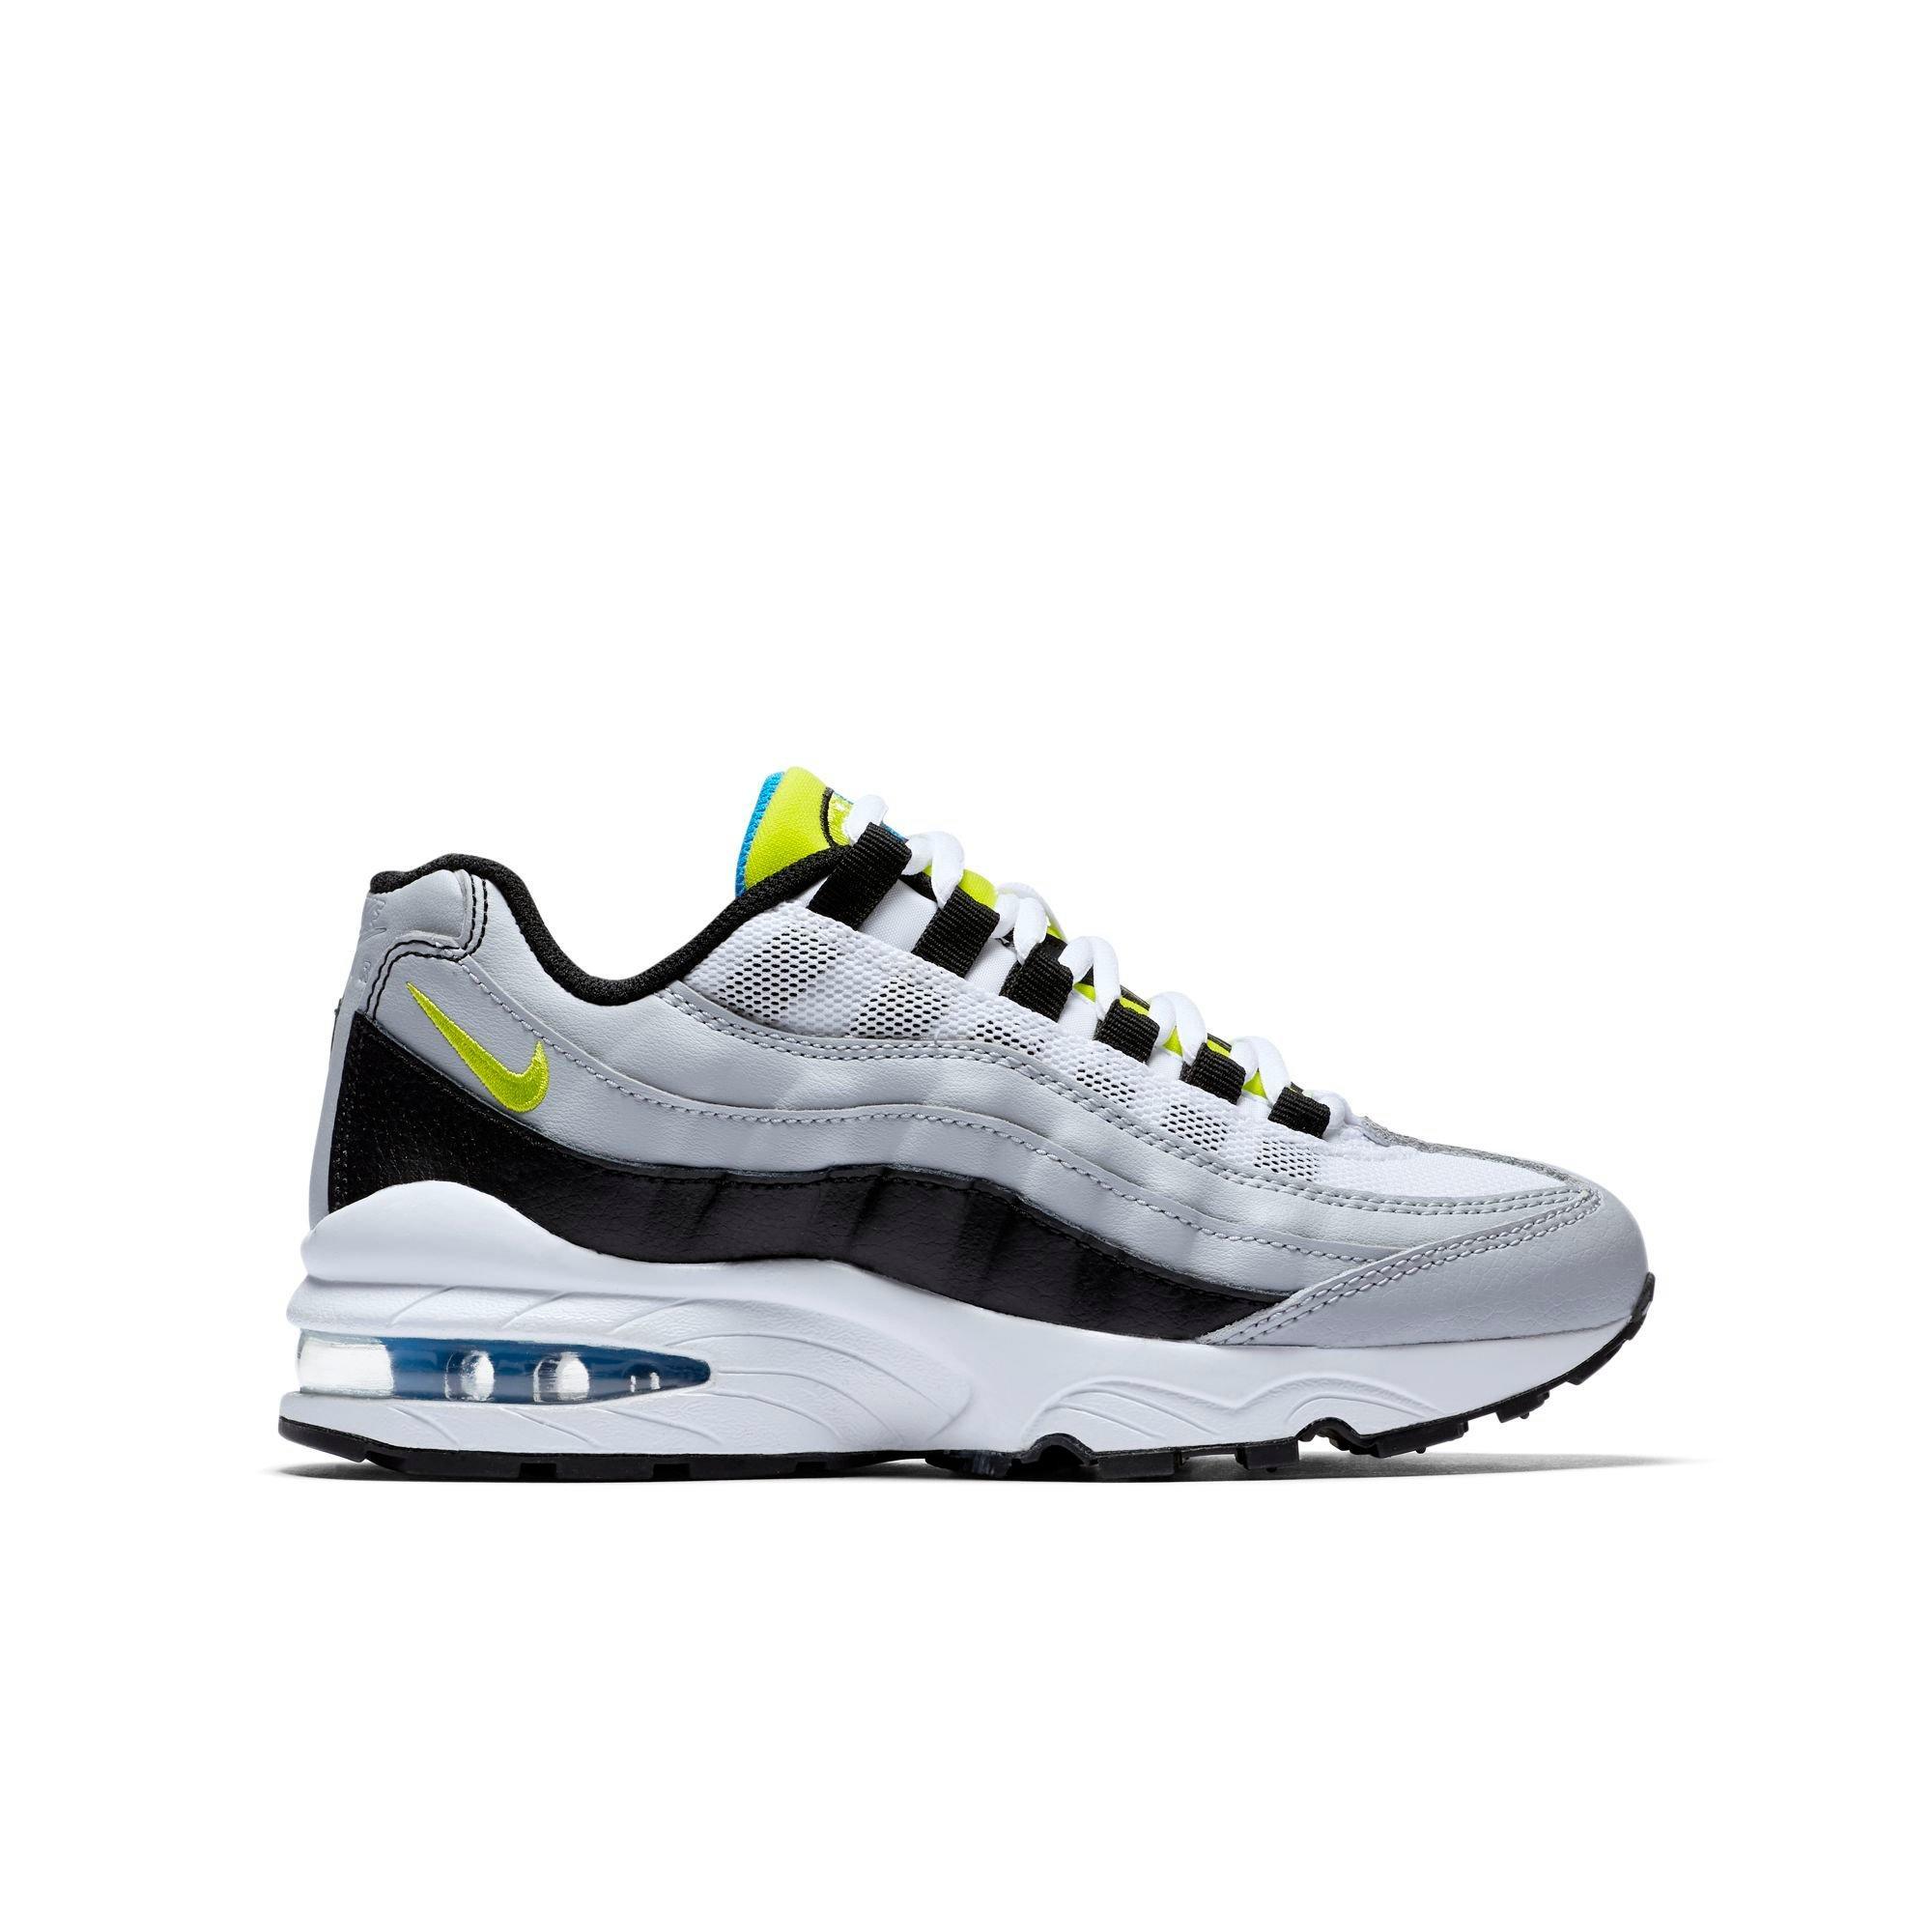 aa500e7084 Nike Air Max 95 \